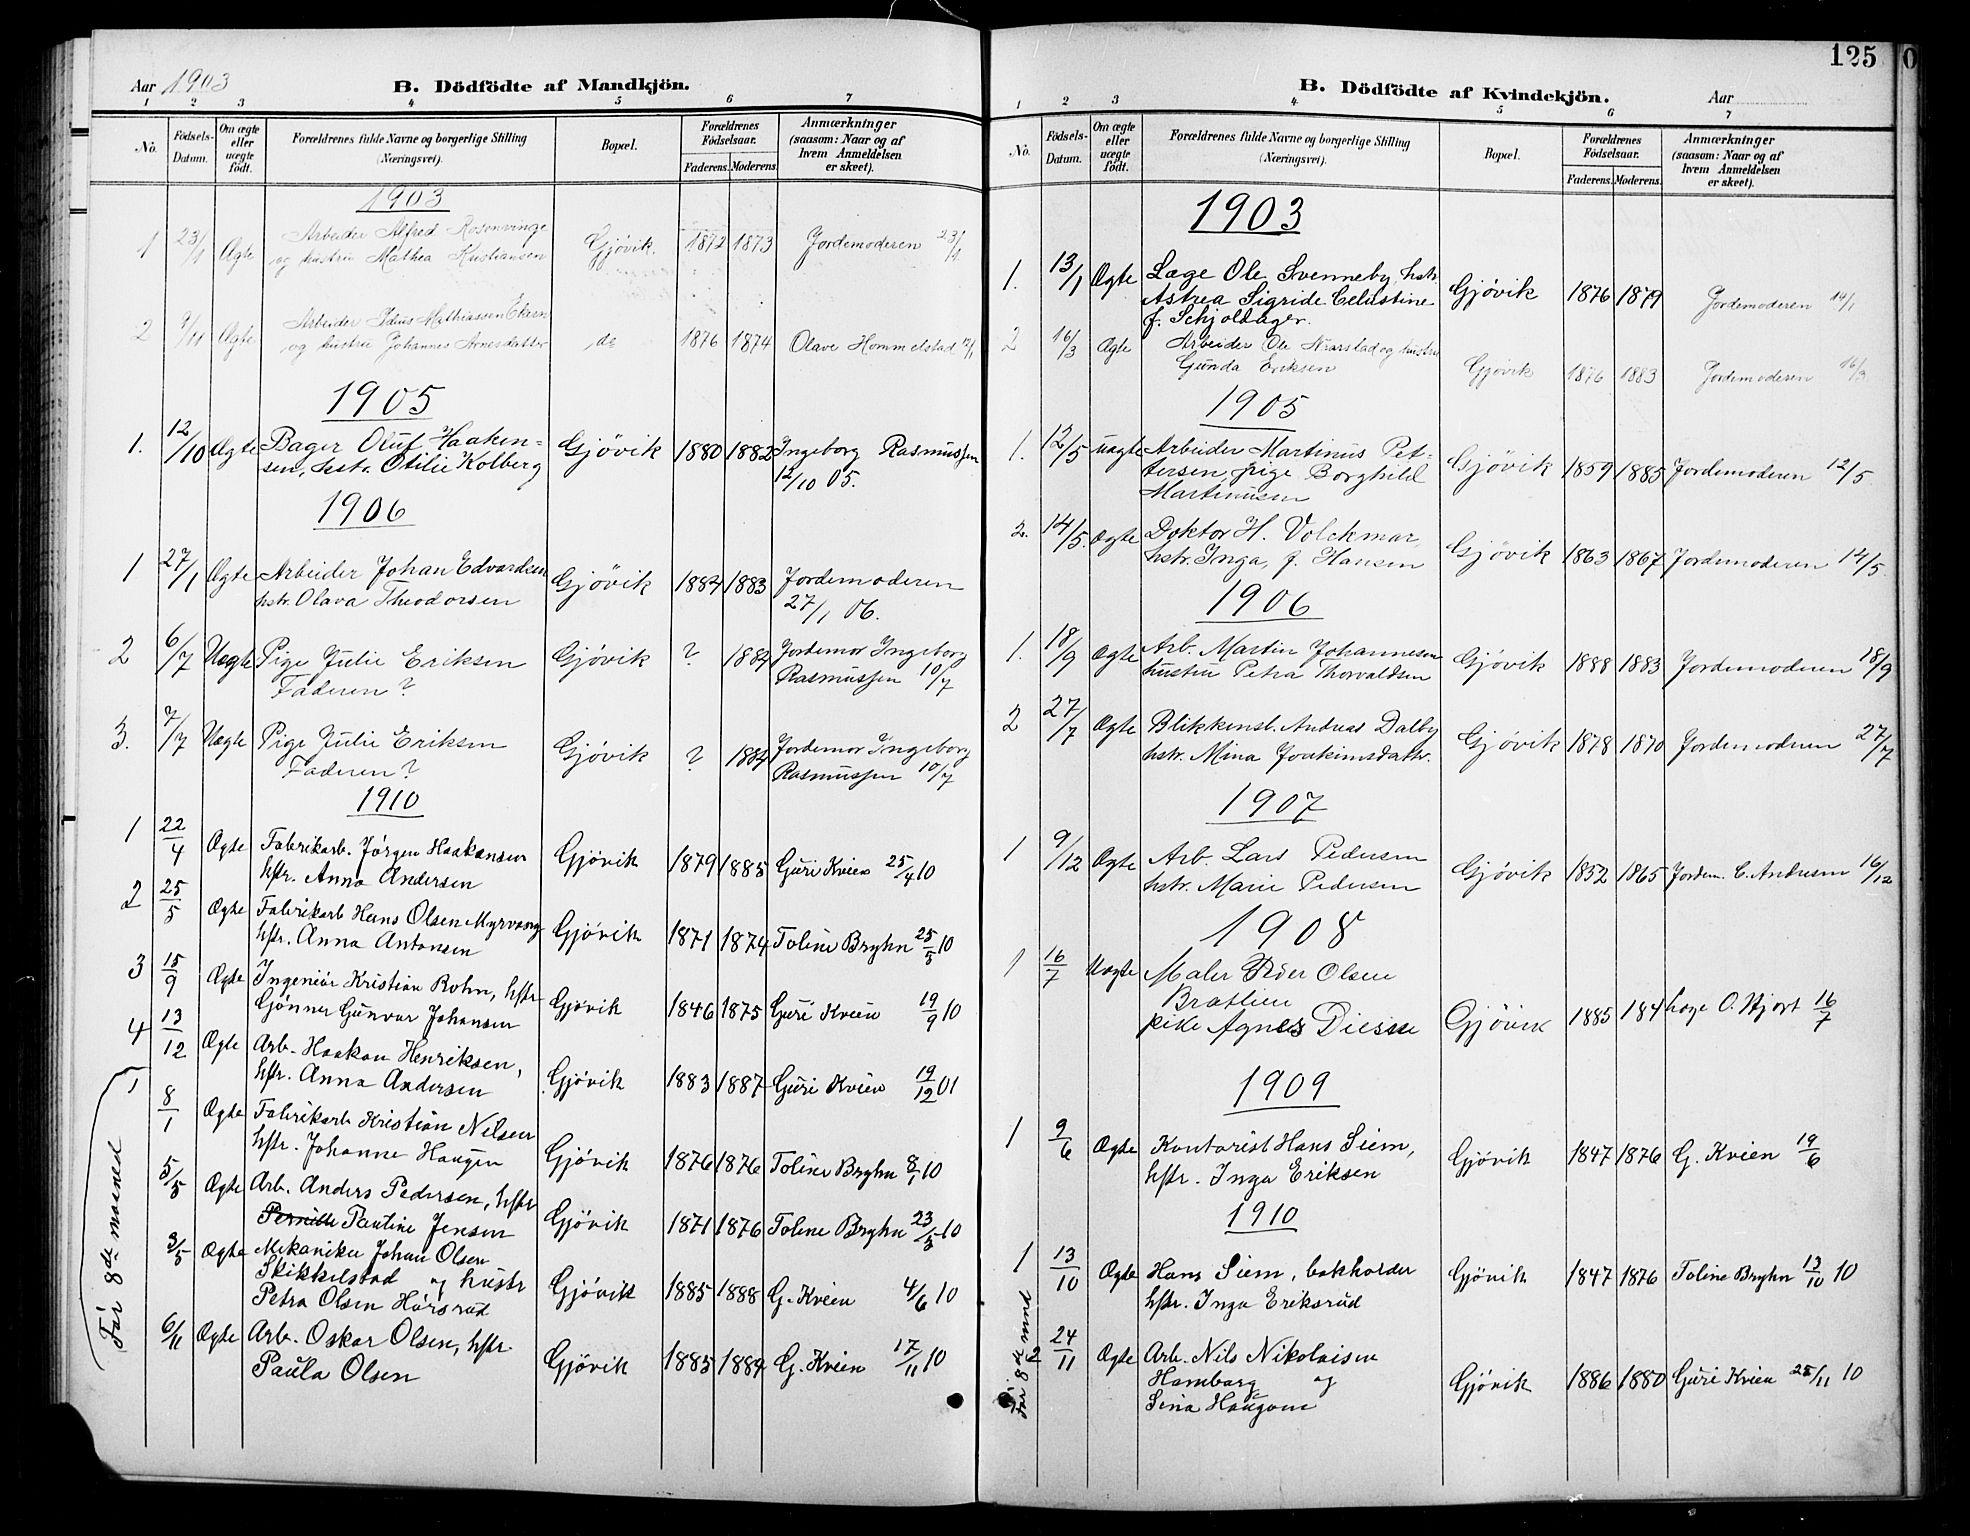 SAH, Vardal prestekontor, H/Ha/Hab/L0012: Klokkerbok nr. 12, 1902-1911, s. 125